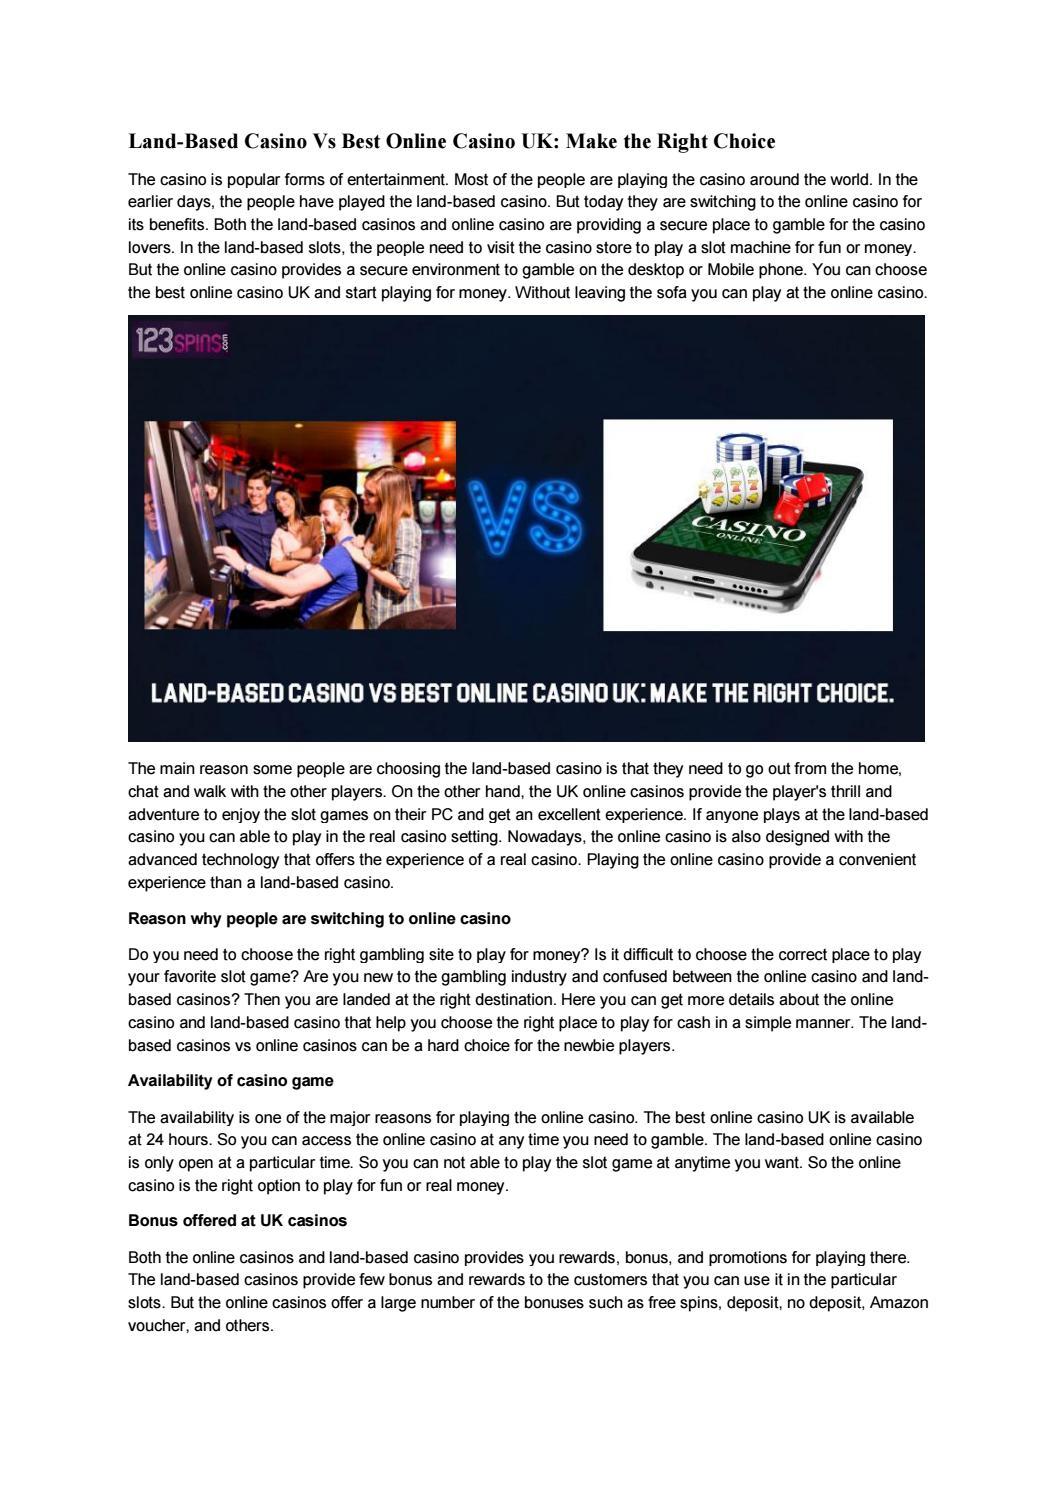 Land Based Casino Vs Best Online Casino Uk Make The Right Choice